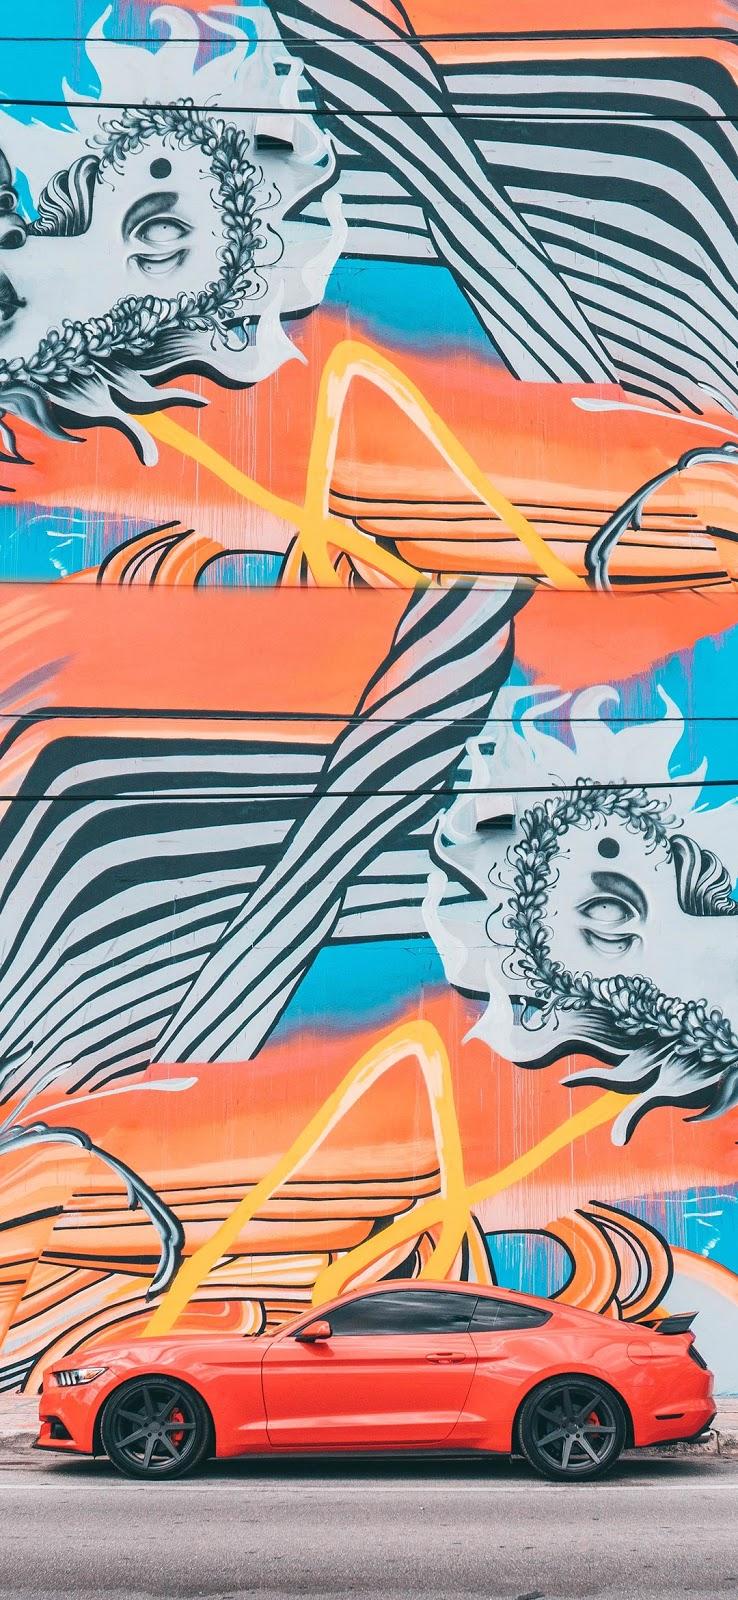 cool orange mustang car wallpaper